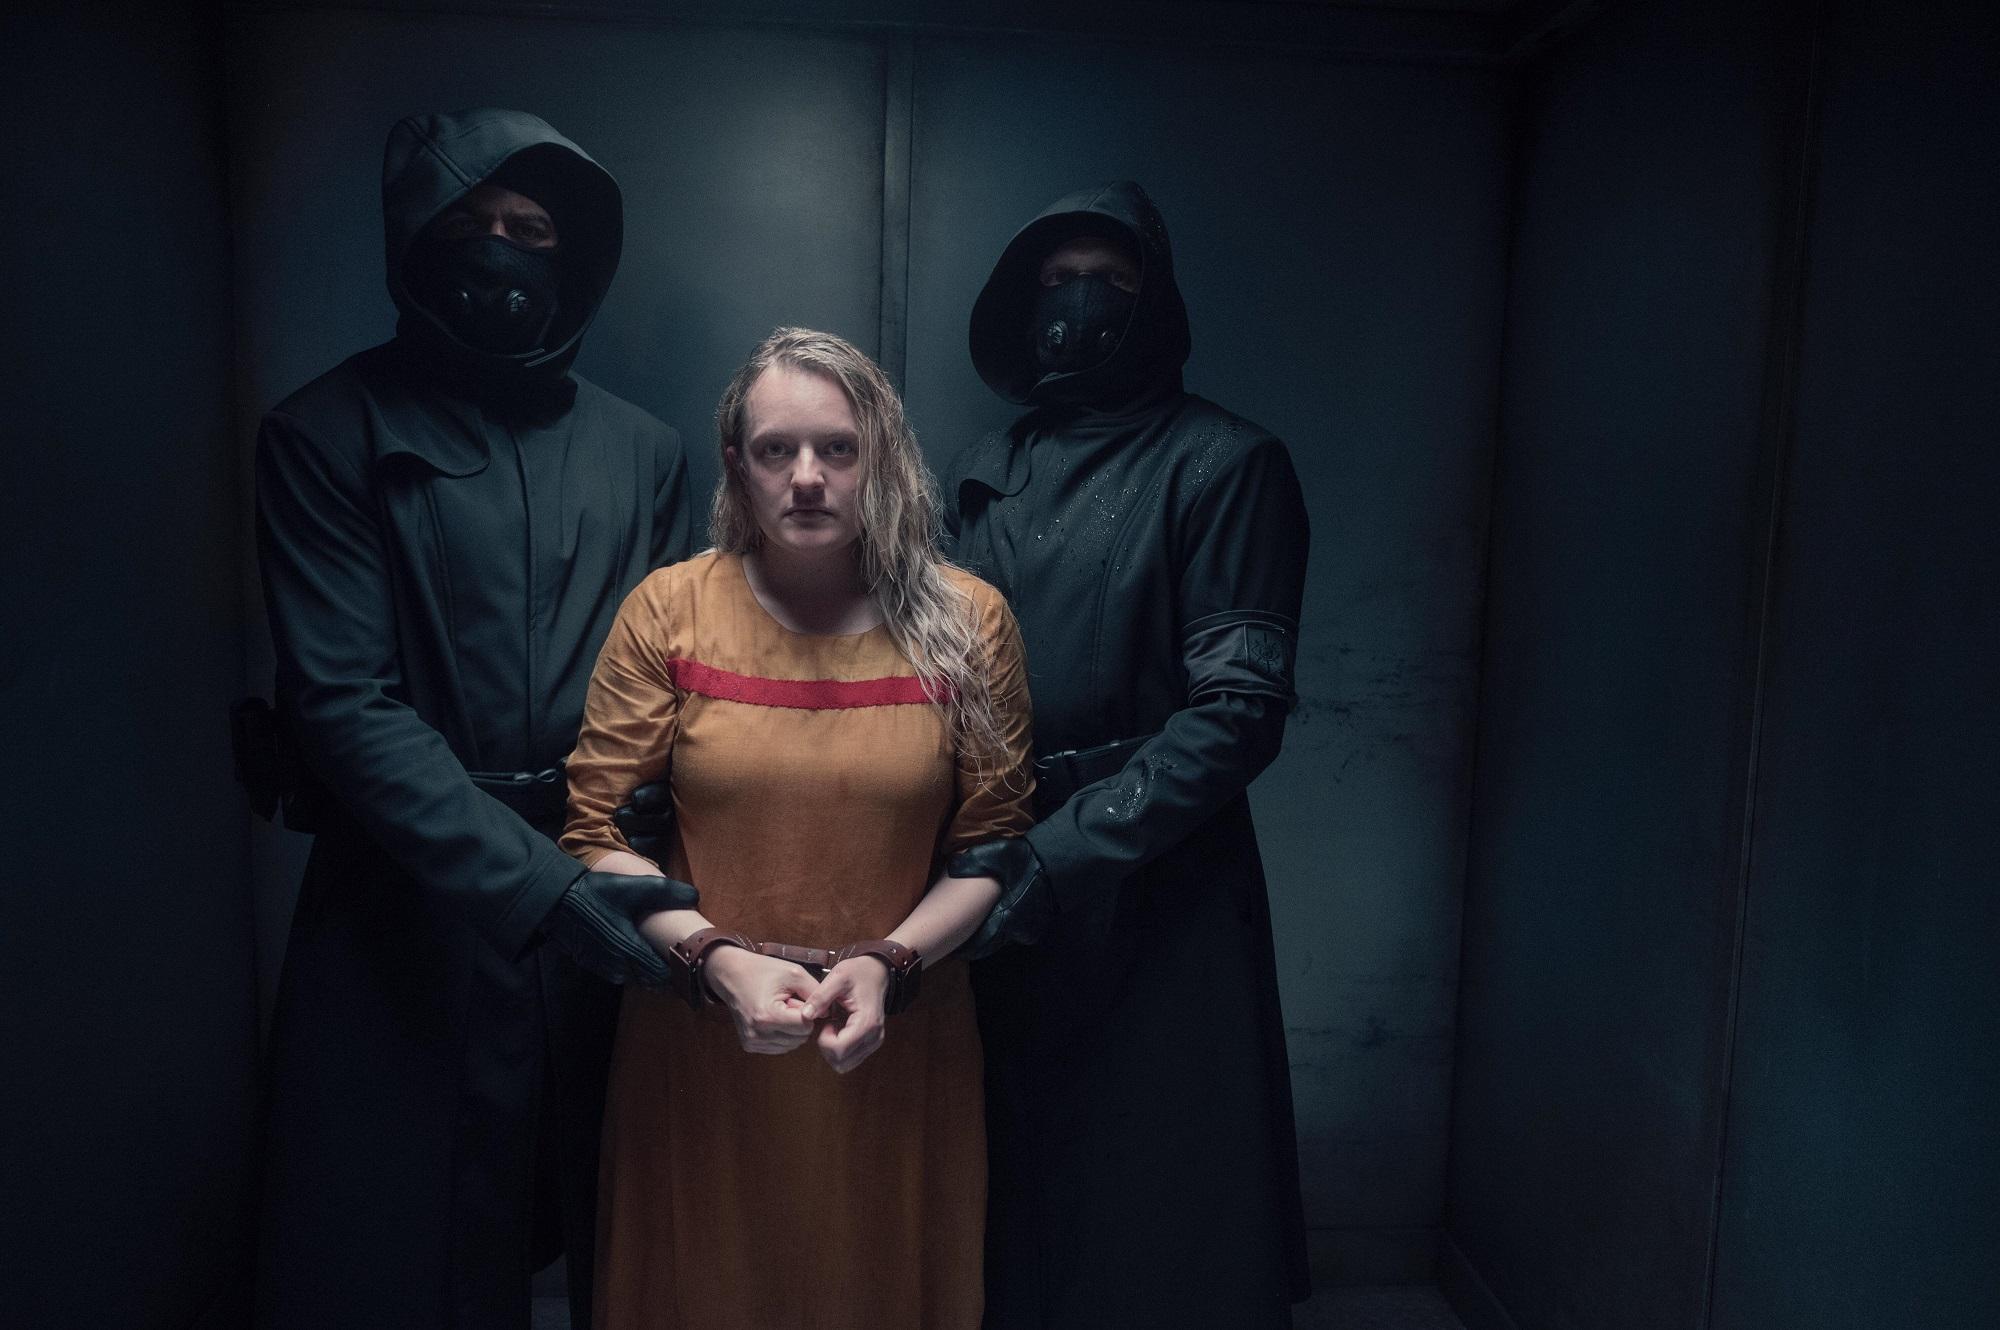 Elisabeth Moss in new season 4 episode 3 of 'The Handmaid's Tale'